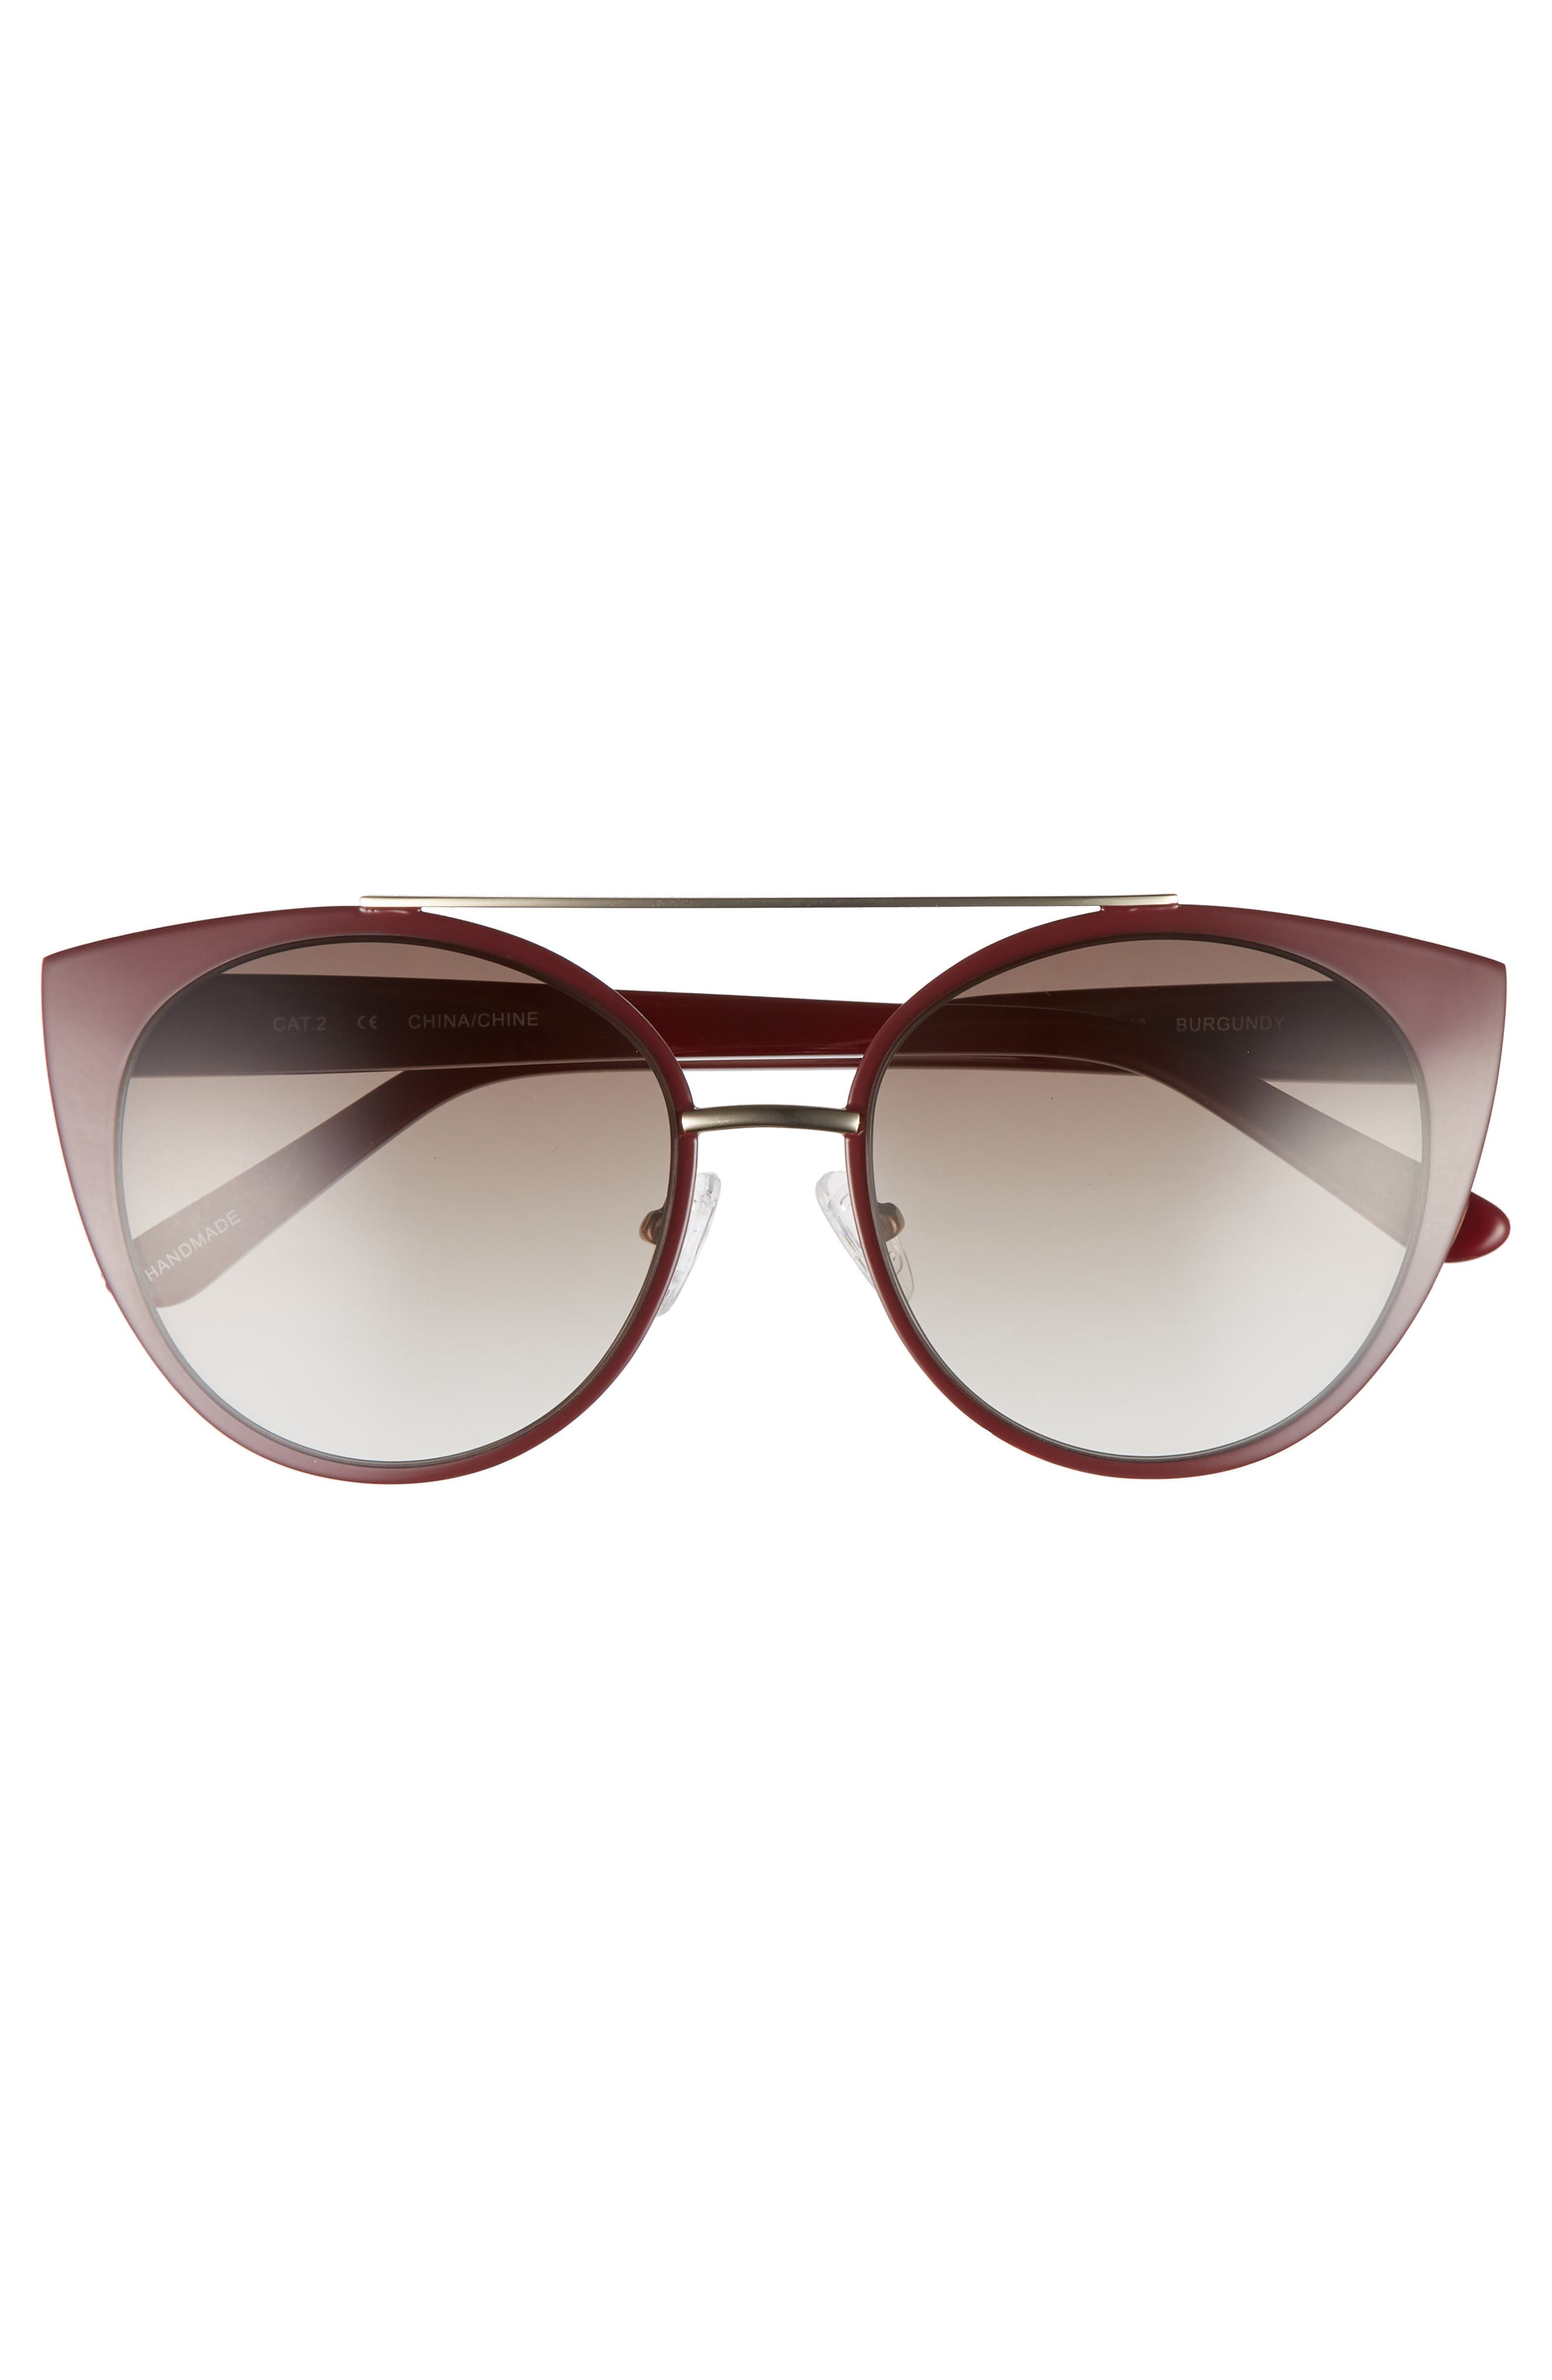 Amelia 53mm Aviator Sunglasses,                             Alternate thumbnail 3, color,                             930